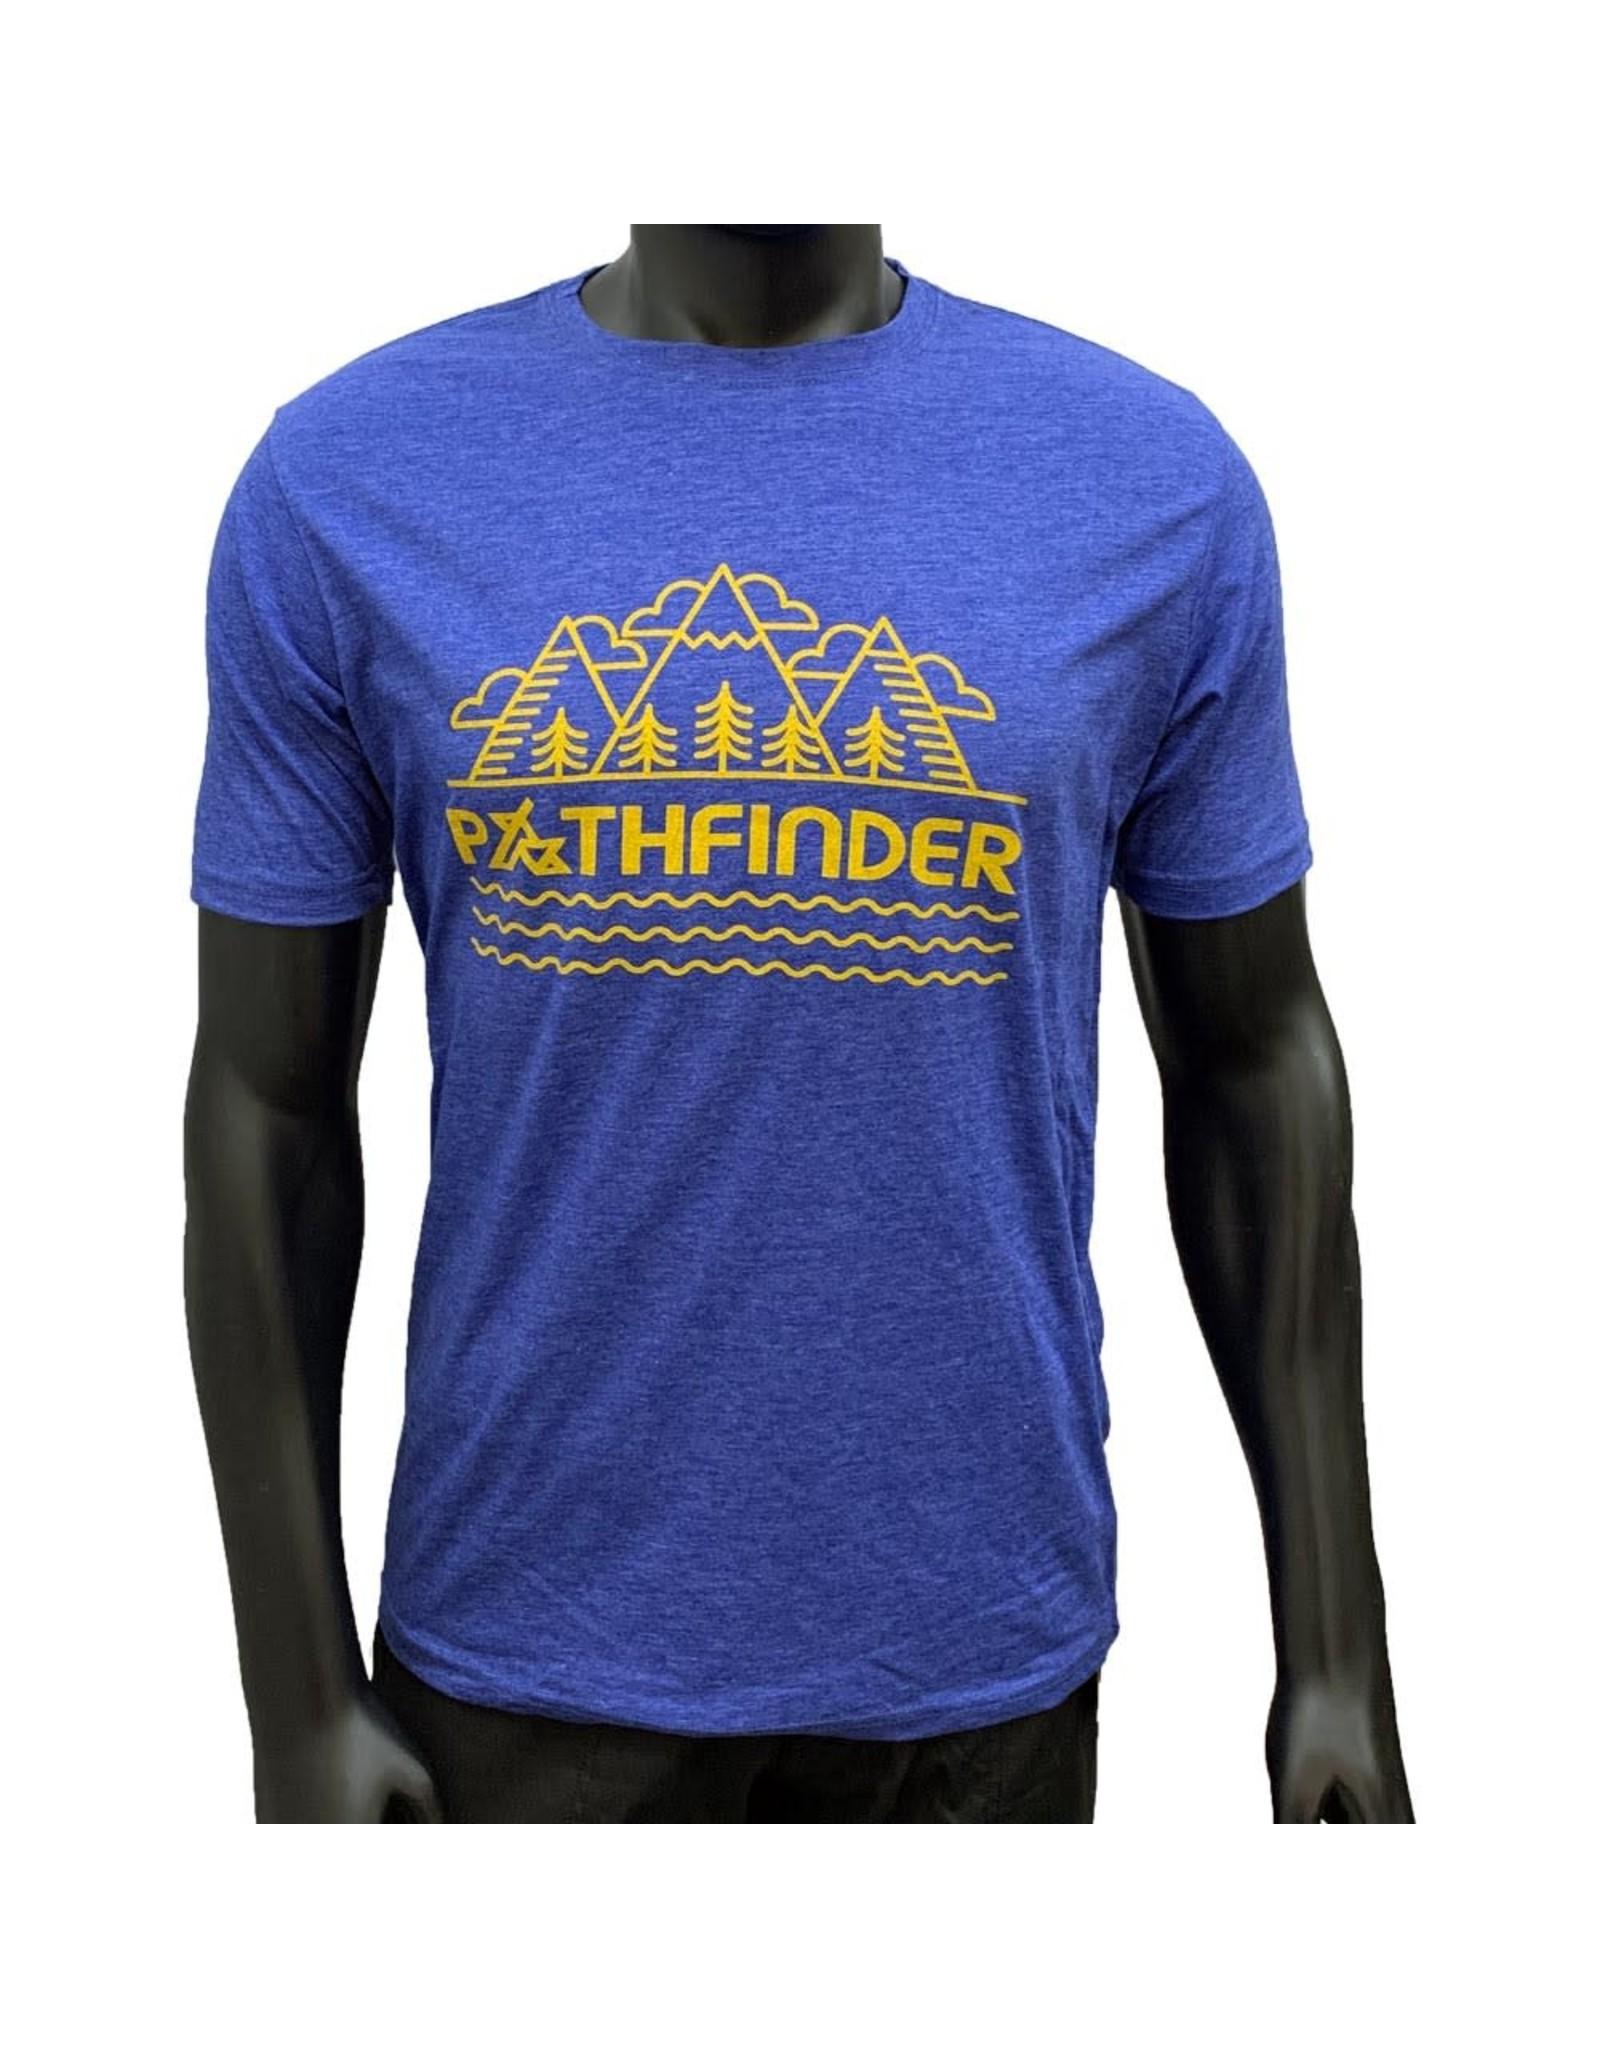 Pathfinder Mountain Poly/Cotton Crew Tee Royal/Gold